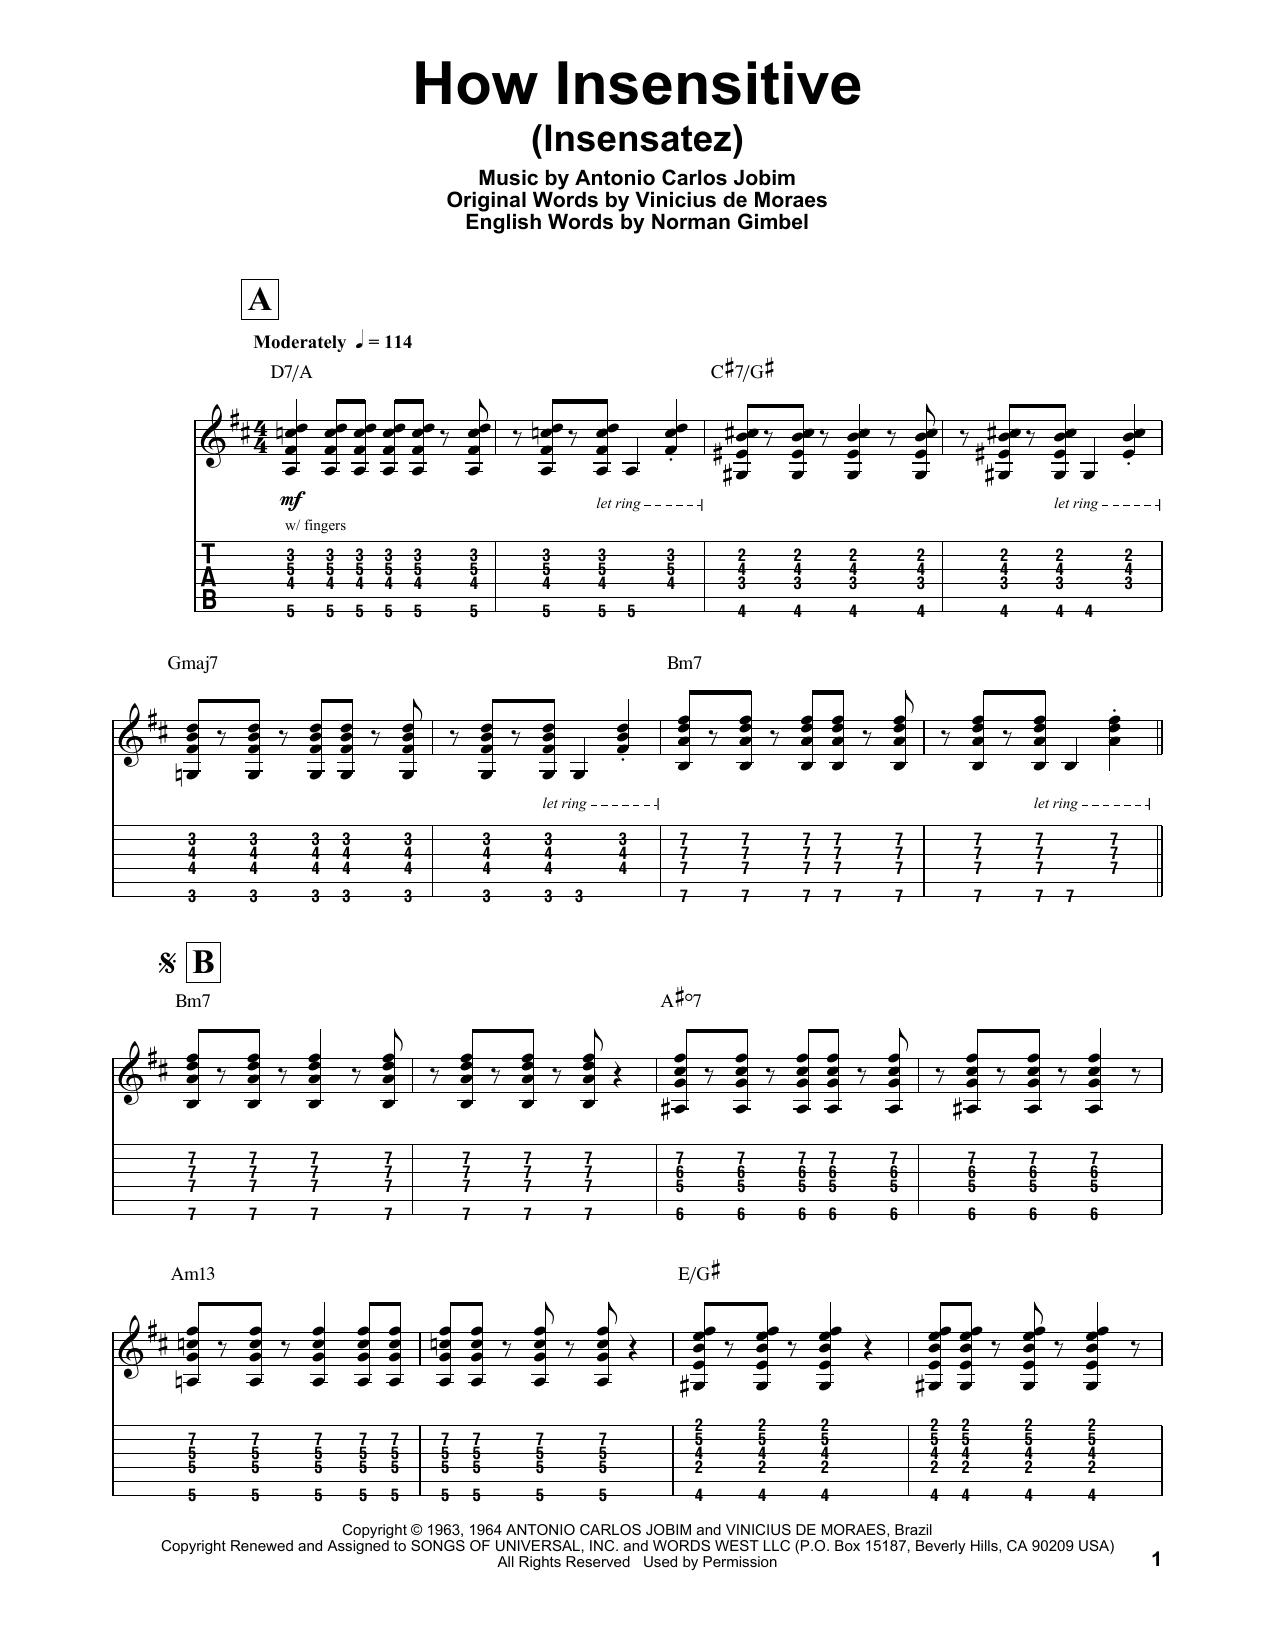 Sheet Music Digital Files To Print Licensed Guitar Tab Play Along